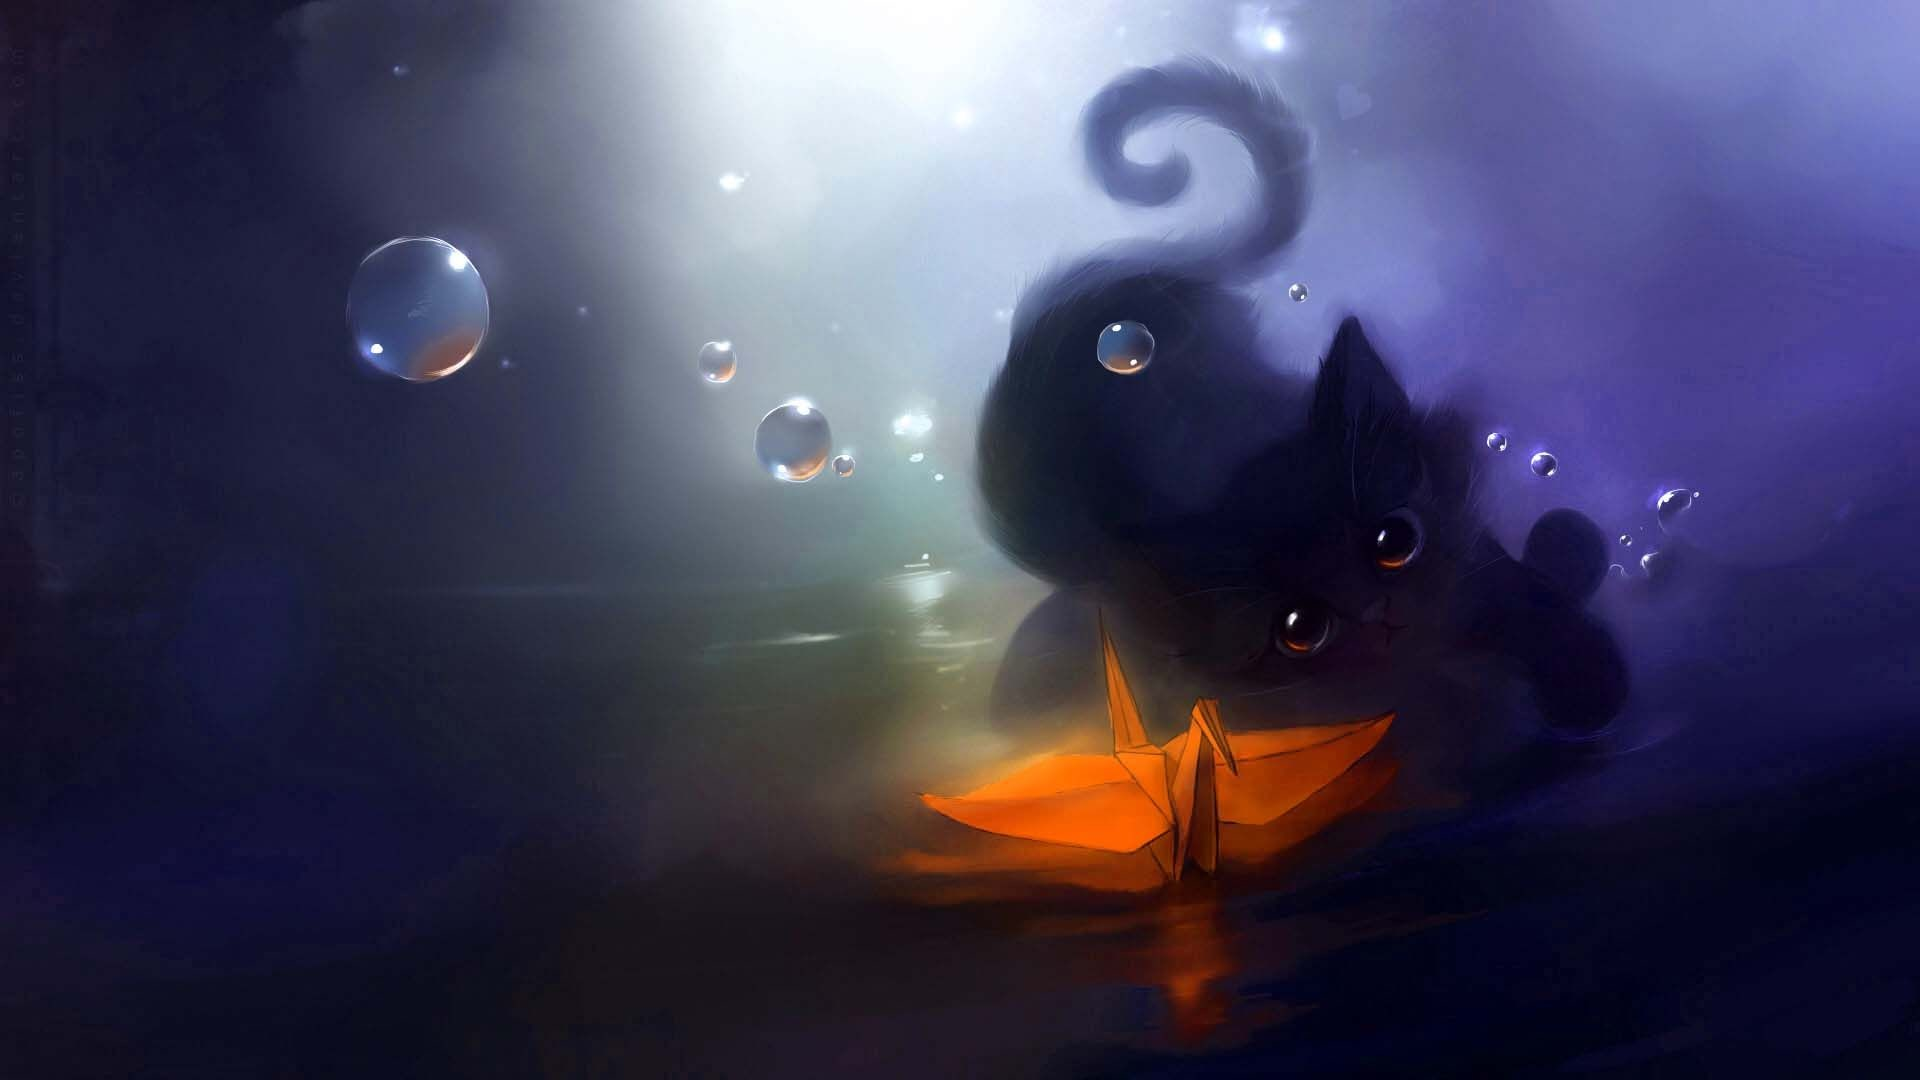 anime-cat-background